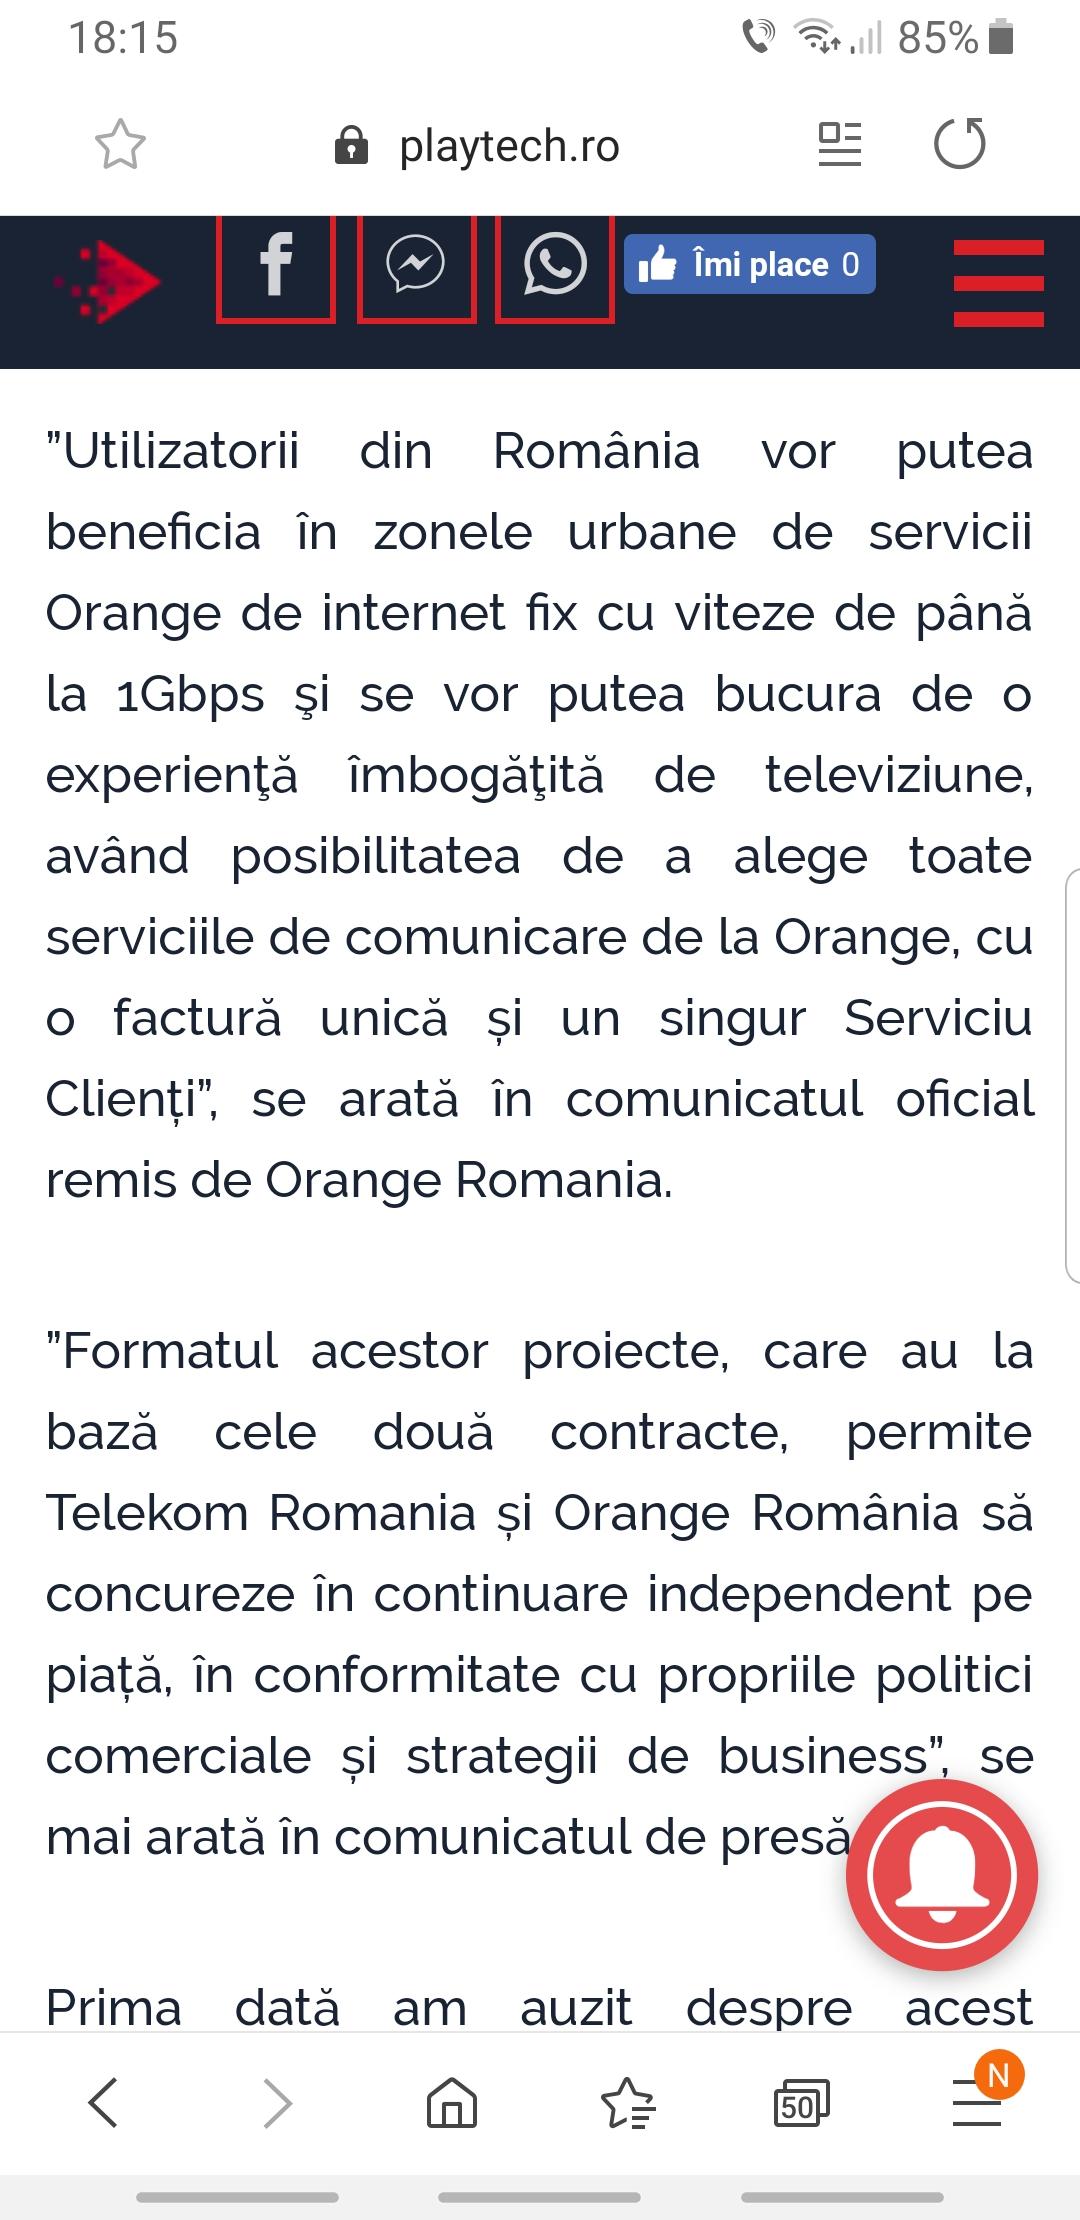 Acoperirea serviciilor internet si tv prin fibra optica la